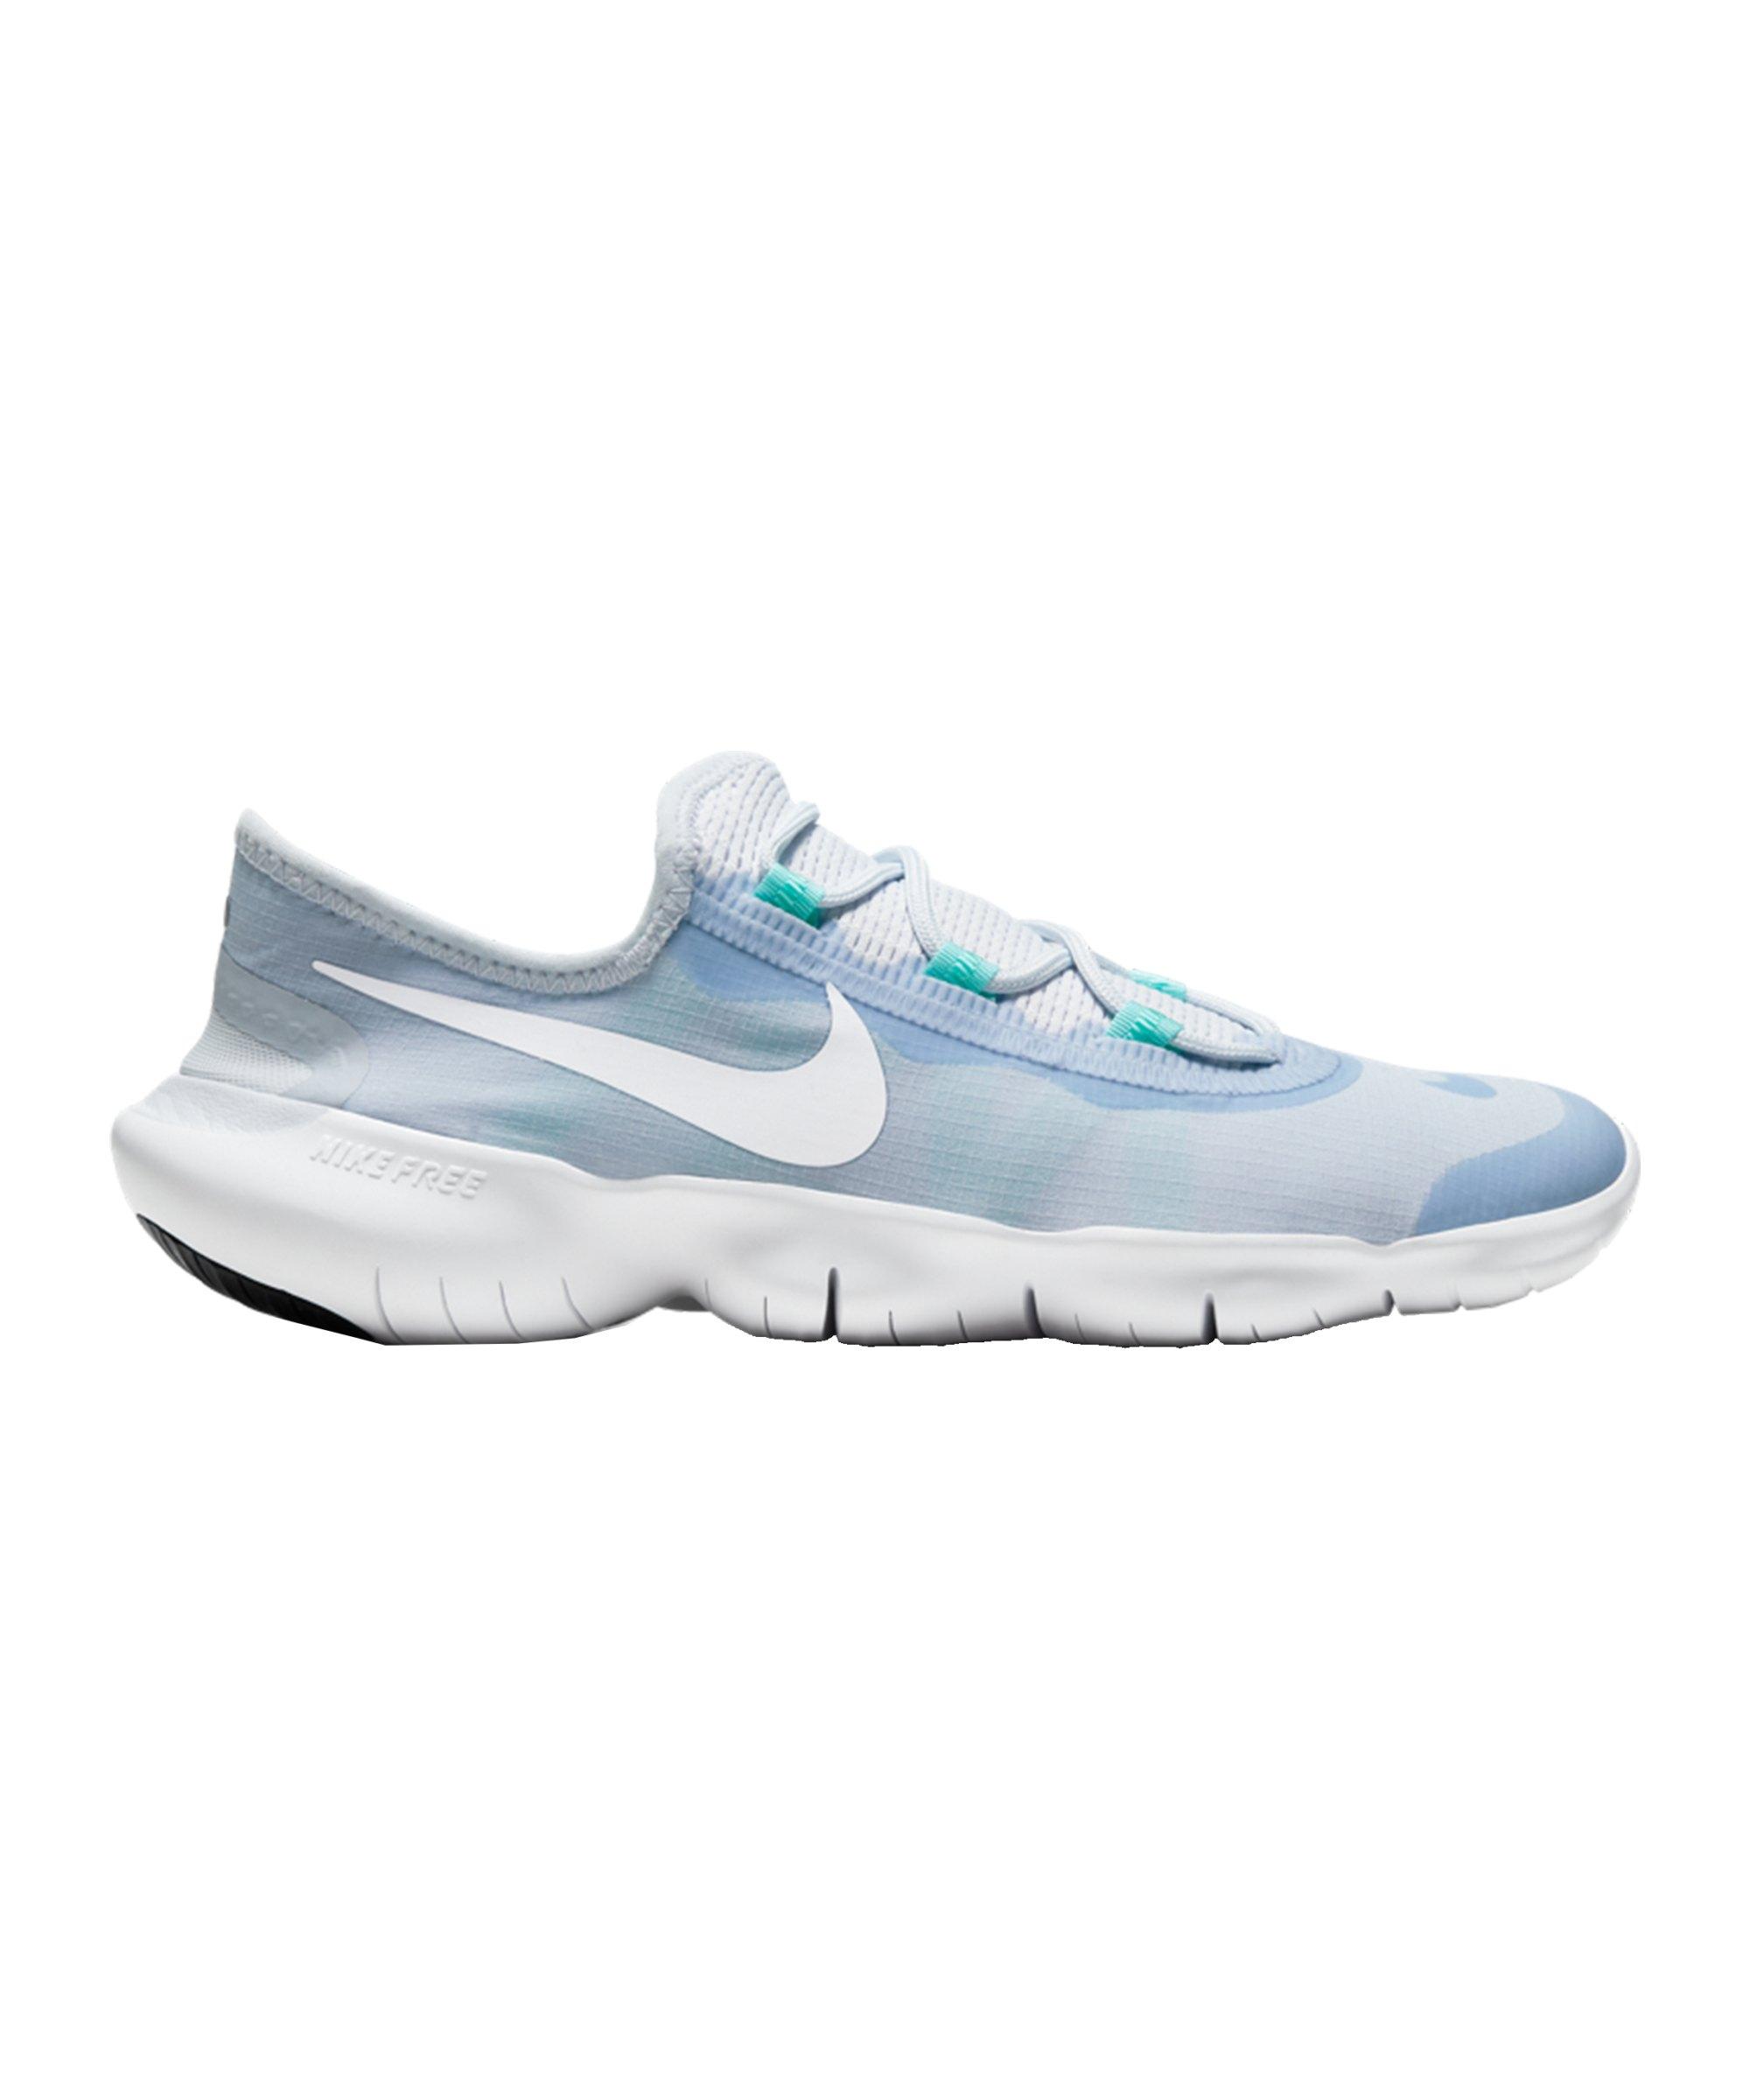 Nike Free Run 5.0 Running Damen Blau F401 - blau